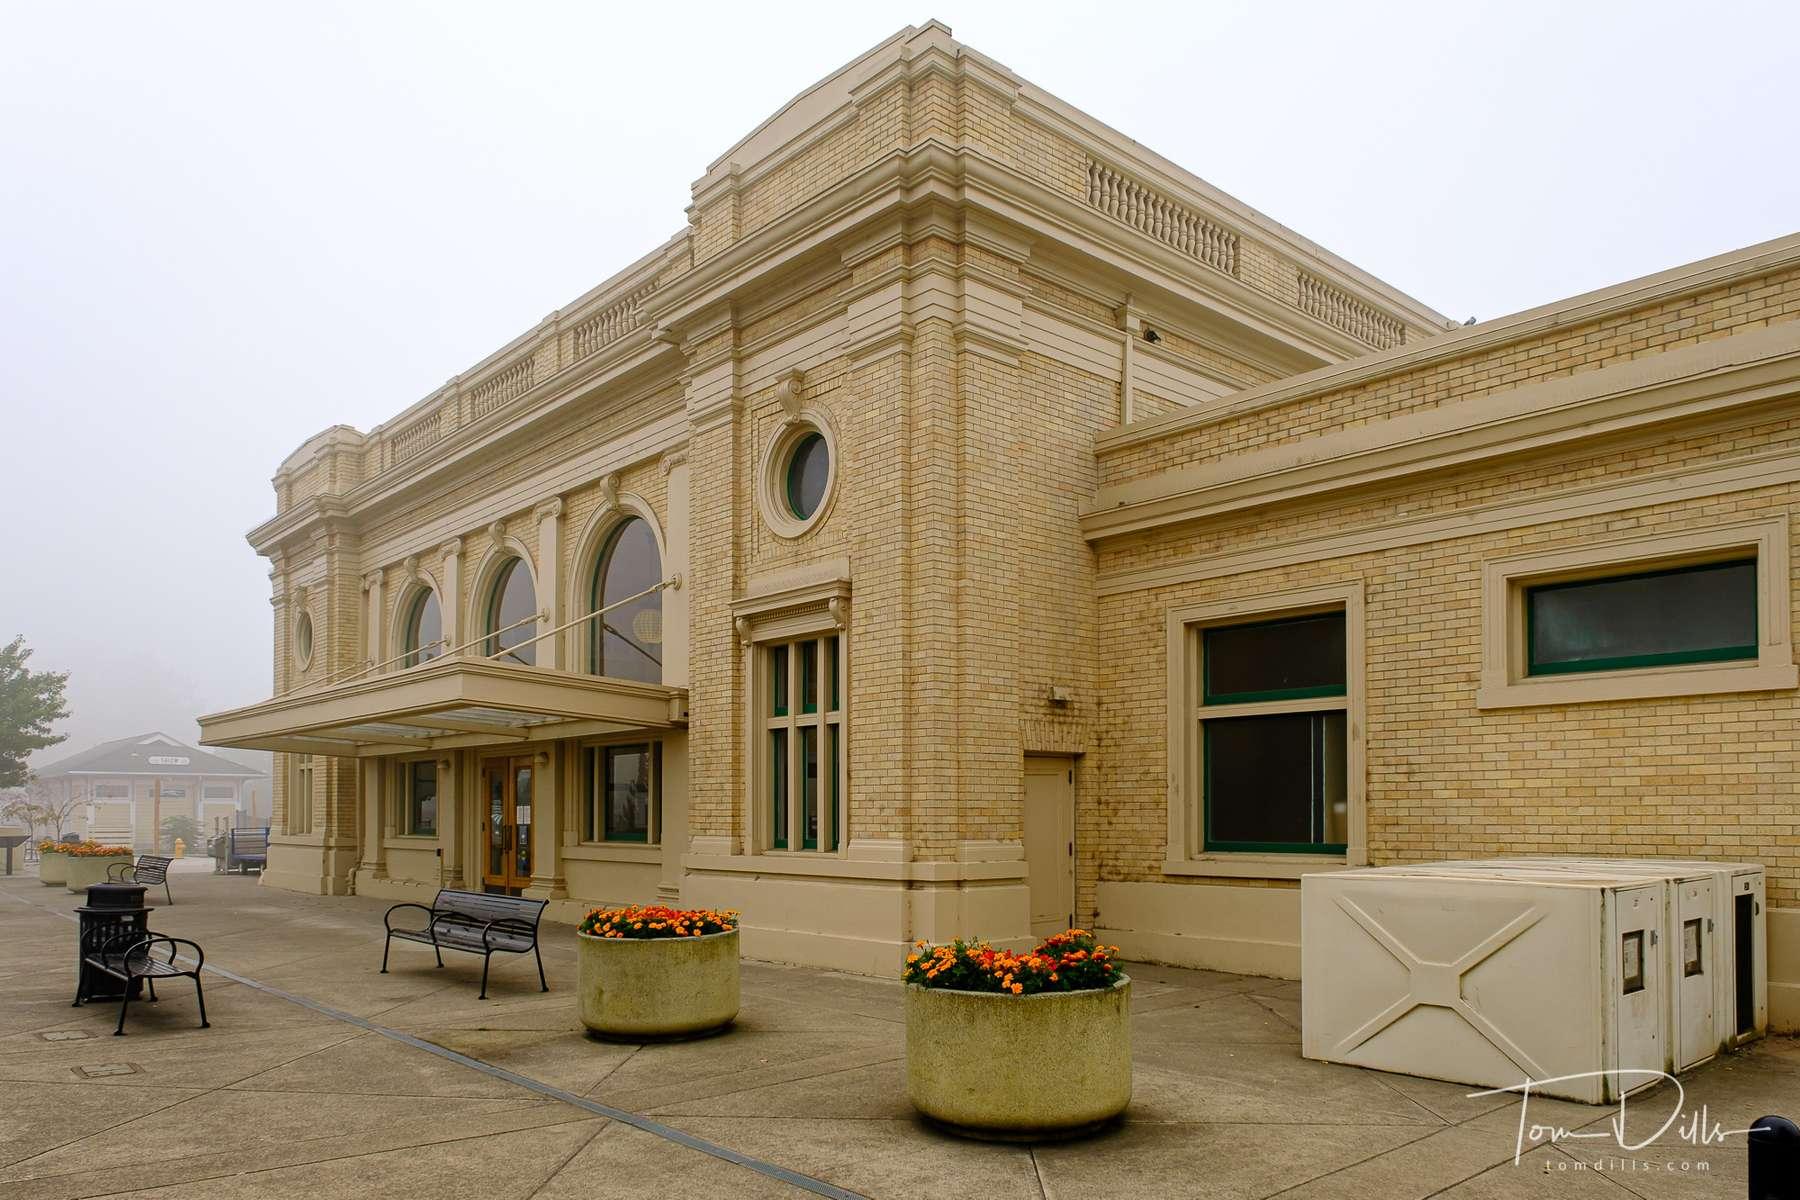 Salem, Oregon Amtrak station and Greyhound Bus depot